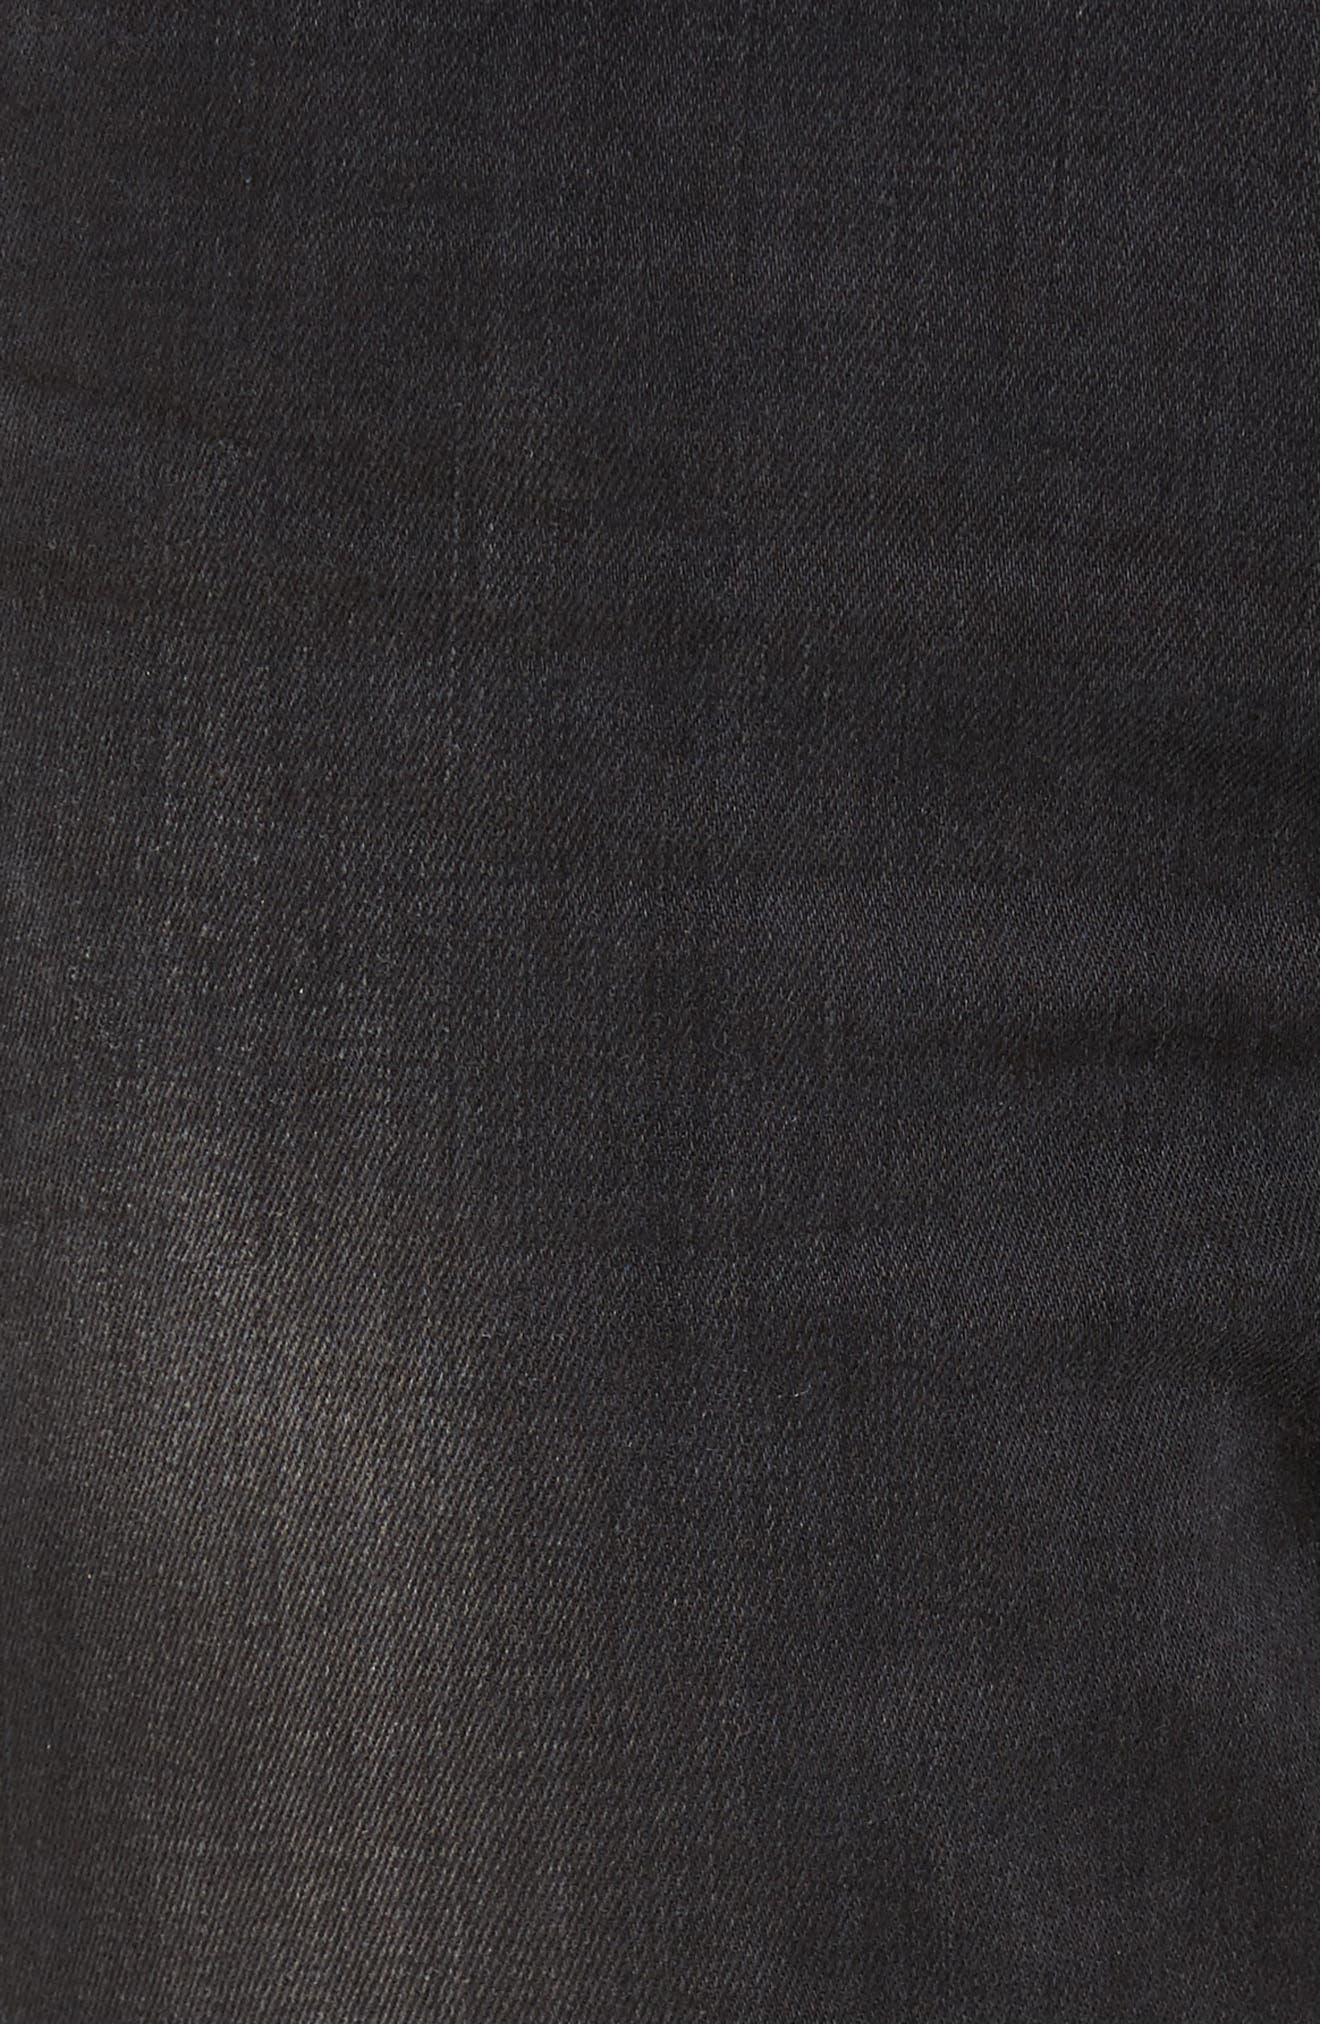 Tellis Slim Fit Jeans,                             Alternate thumbnail 5, color,                             3 Years Cinema